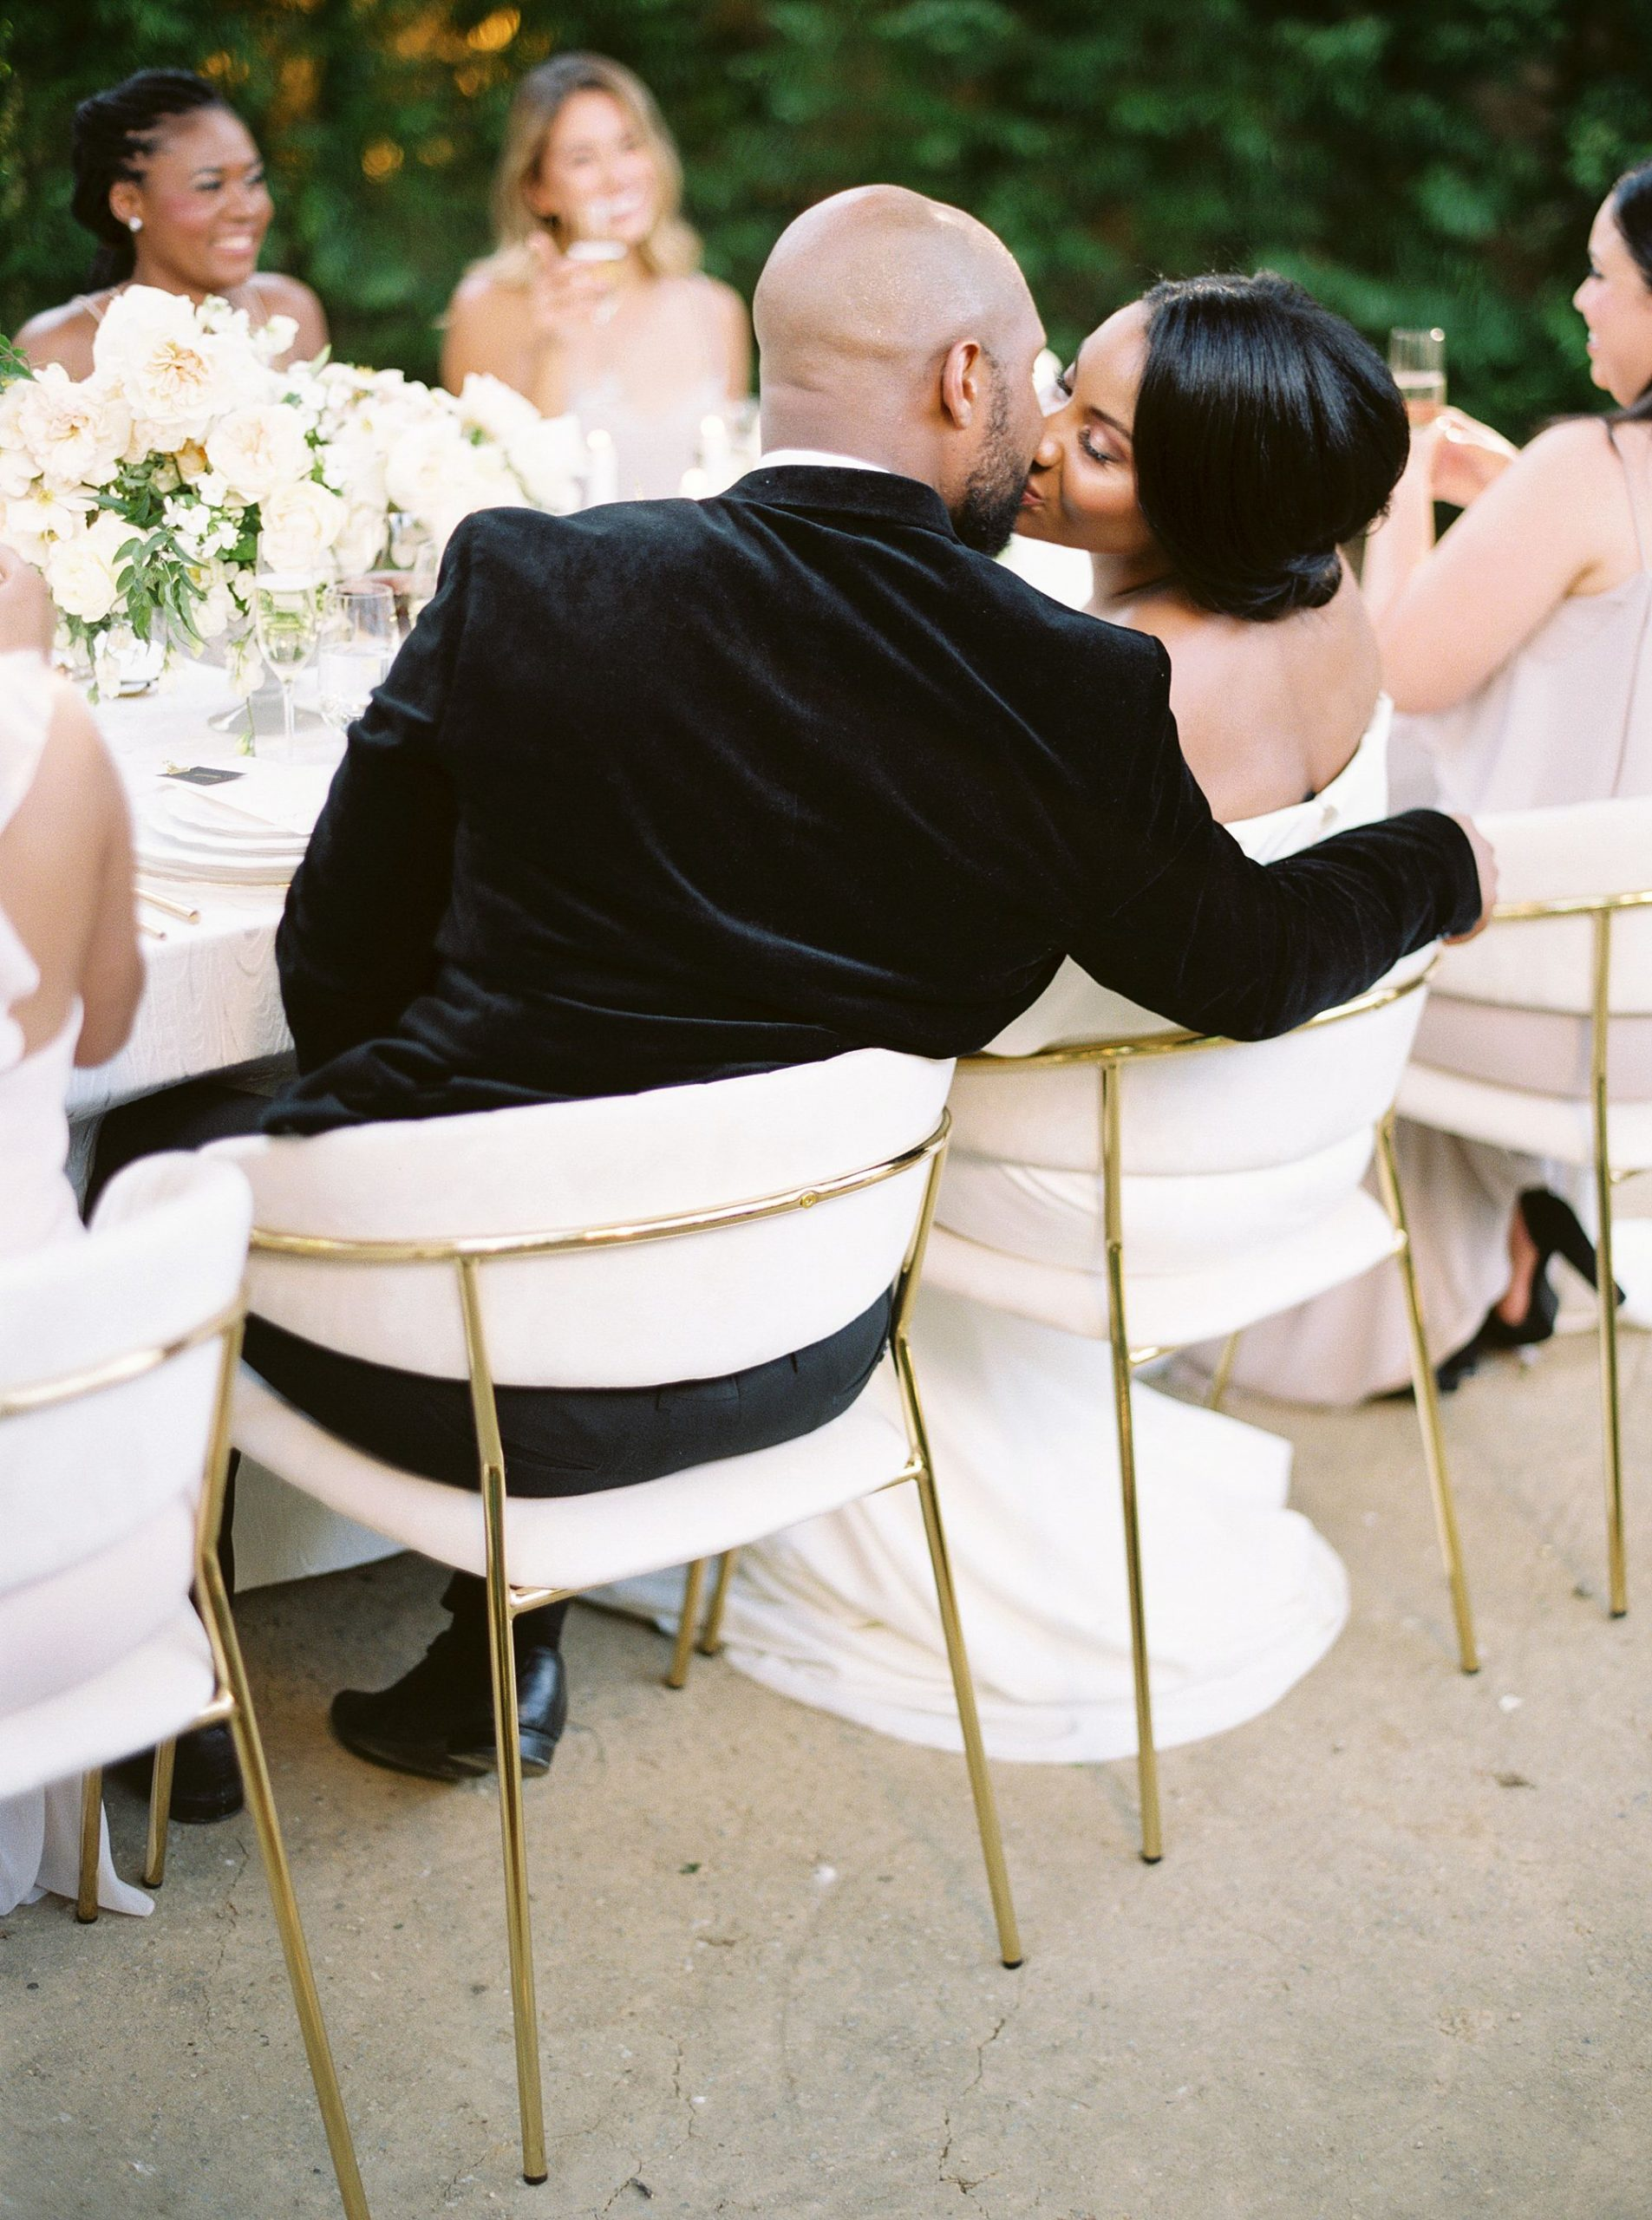 Park Winters Micro-Wedding Inspiration on Style Me Pretty - Stephanie Teague Events - Ashley Baumgartner - Park Winters Wedding - Black Tie Wedding - Micro-Wedding Sacramento Photographer_0004.jpg